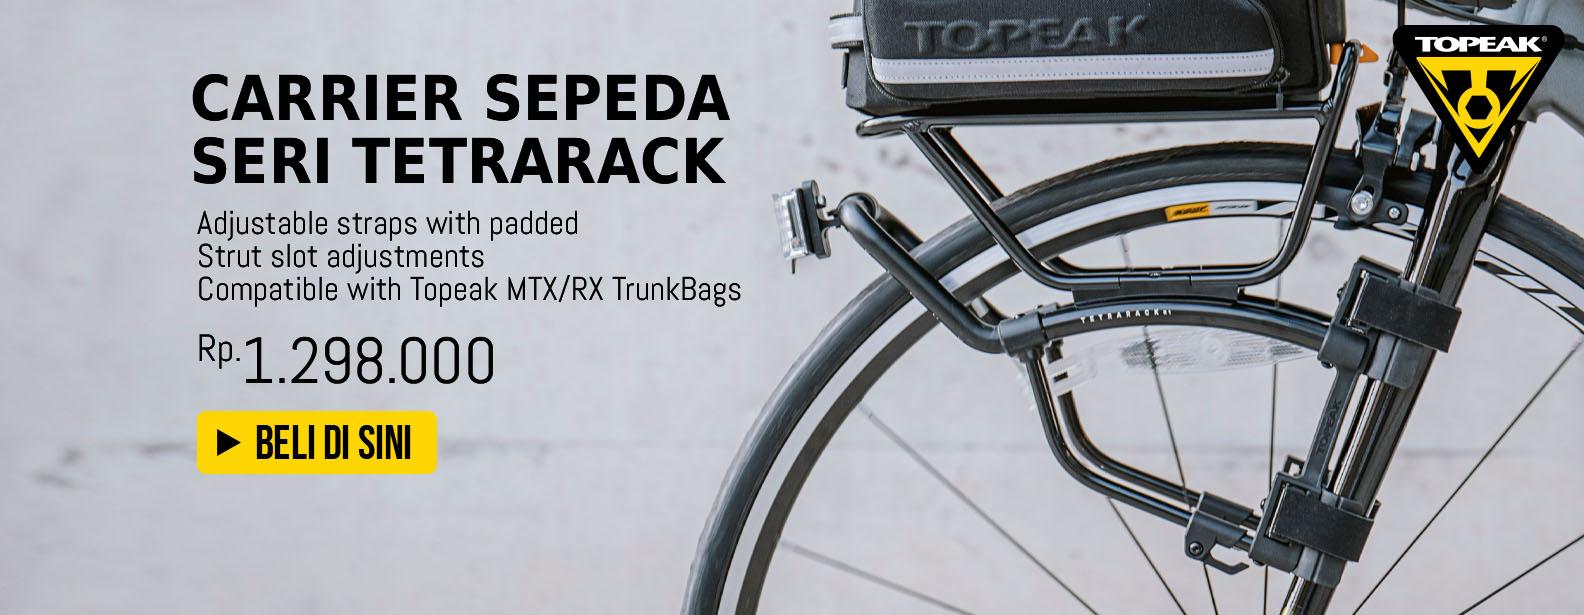 Topeak Tetrarack Series